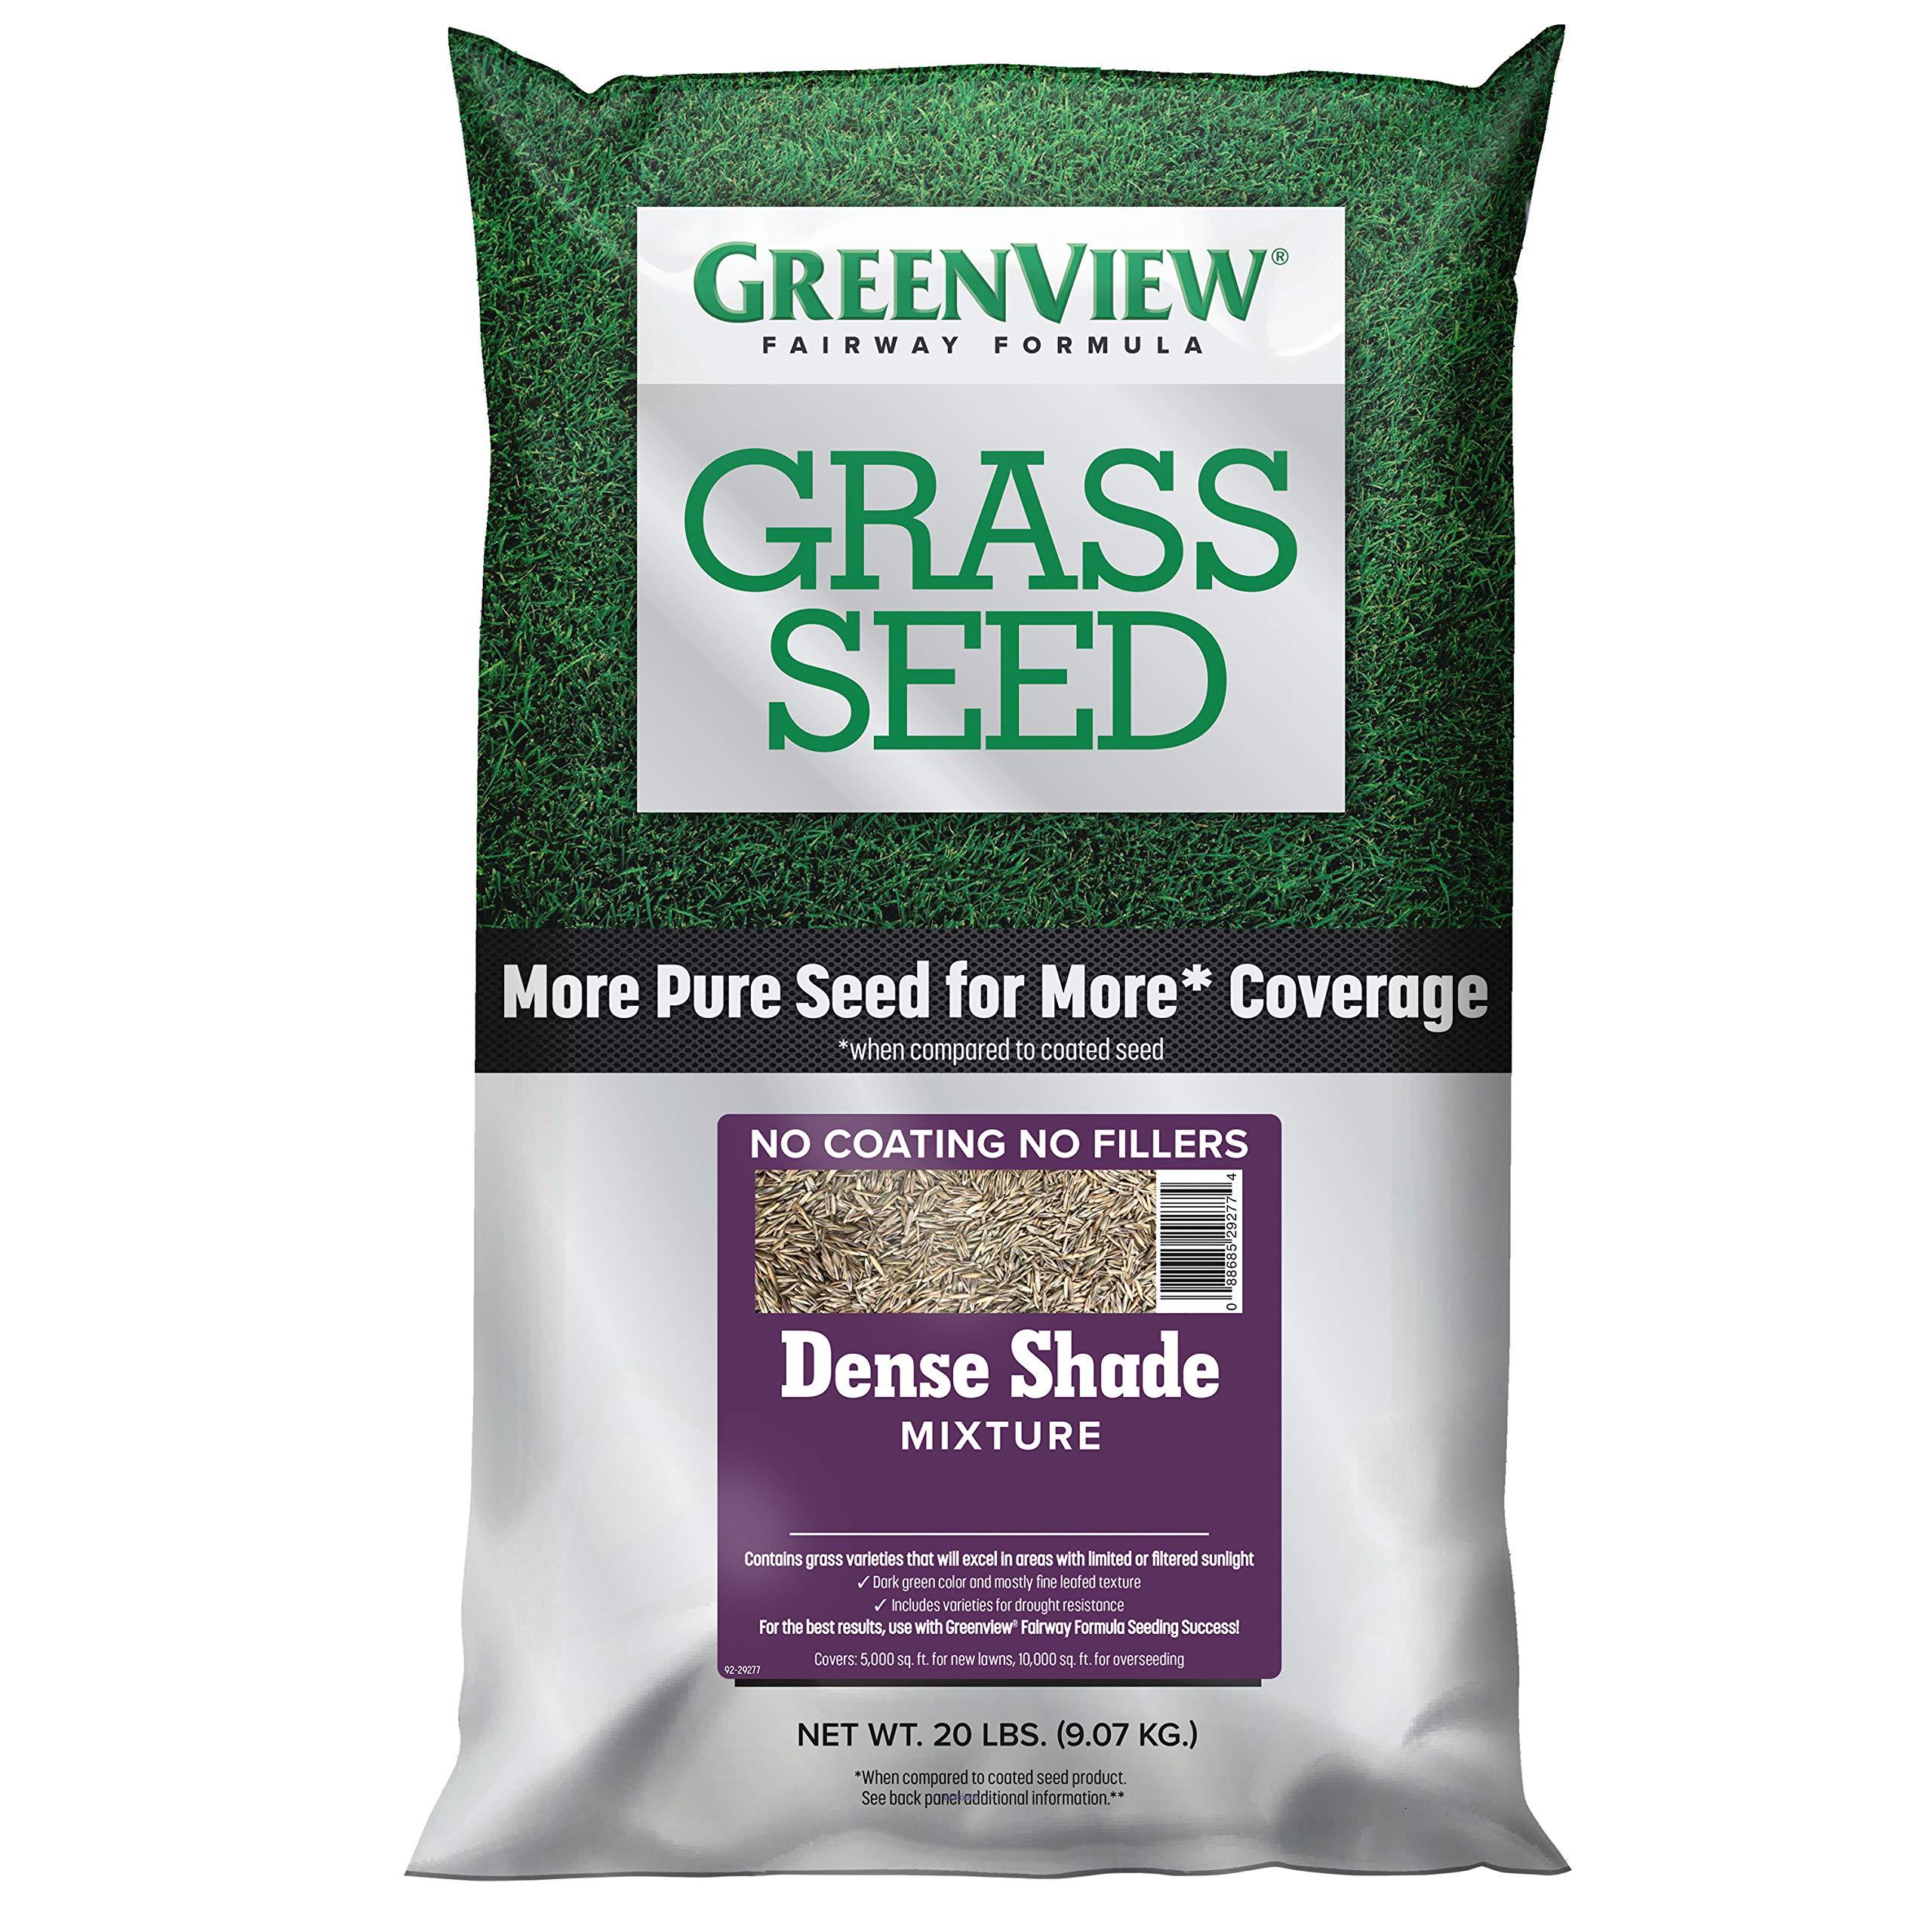 GreenView 2829344 Fairway Formula Grass Seed Dense Shade Mixture, 20 lb. by GreenView